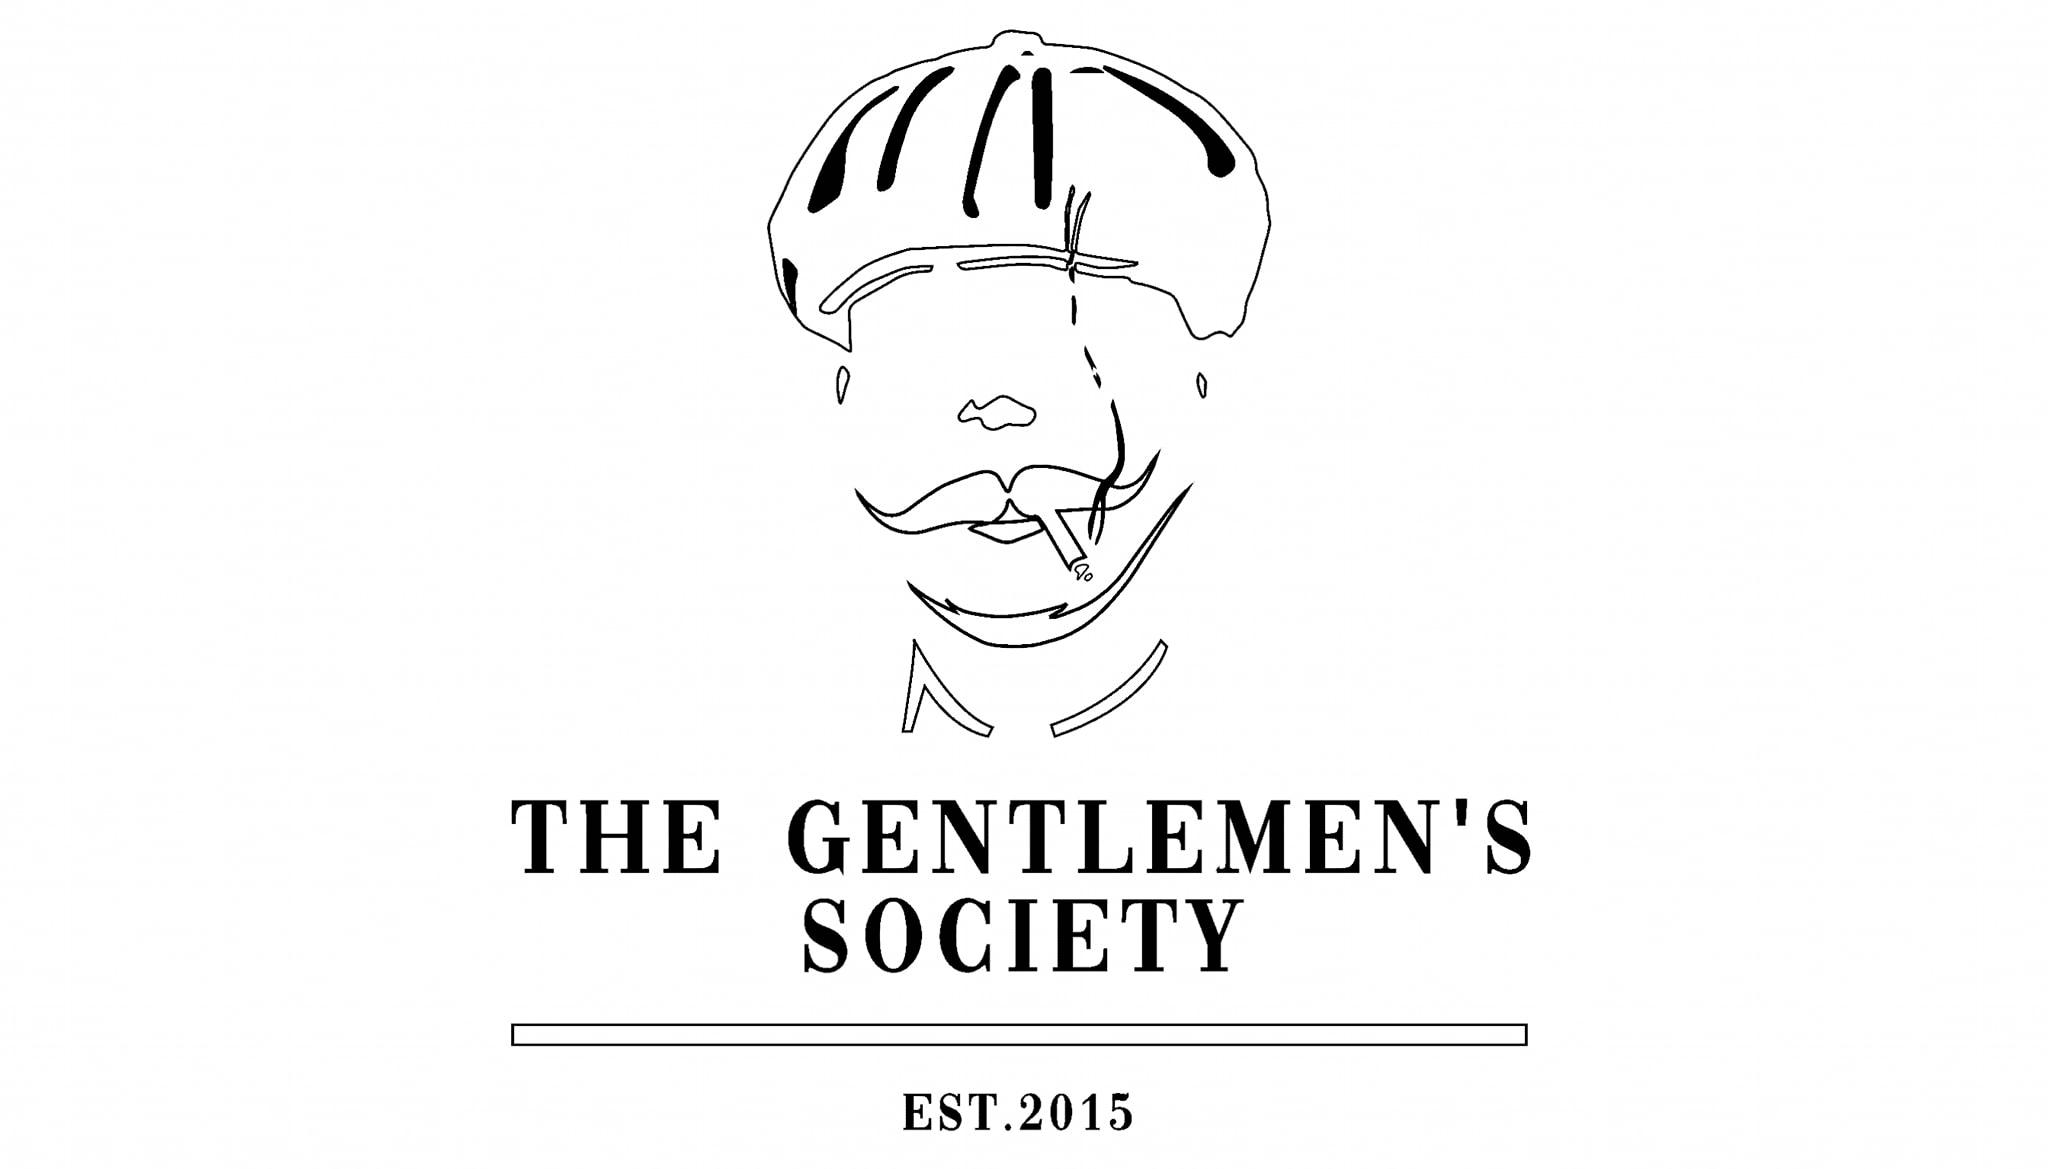 The Gentlemen's Society